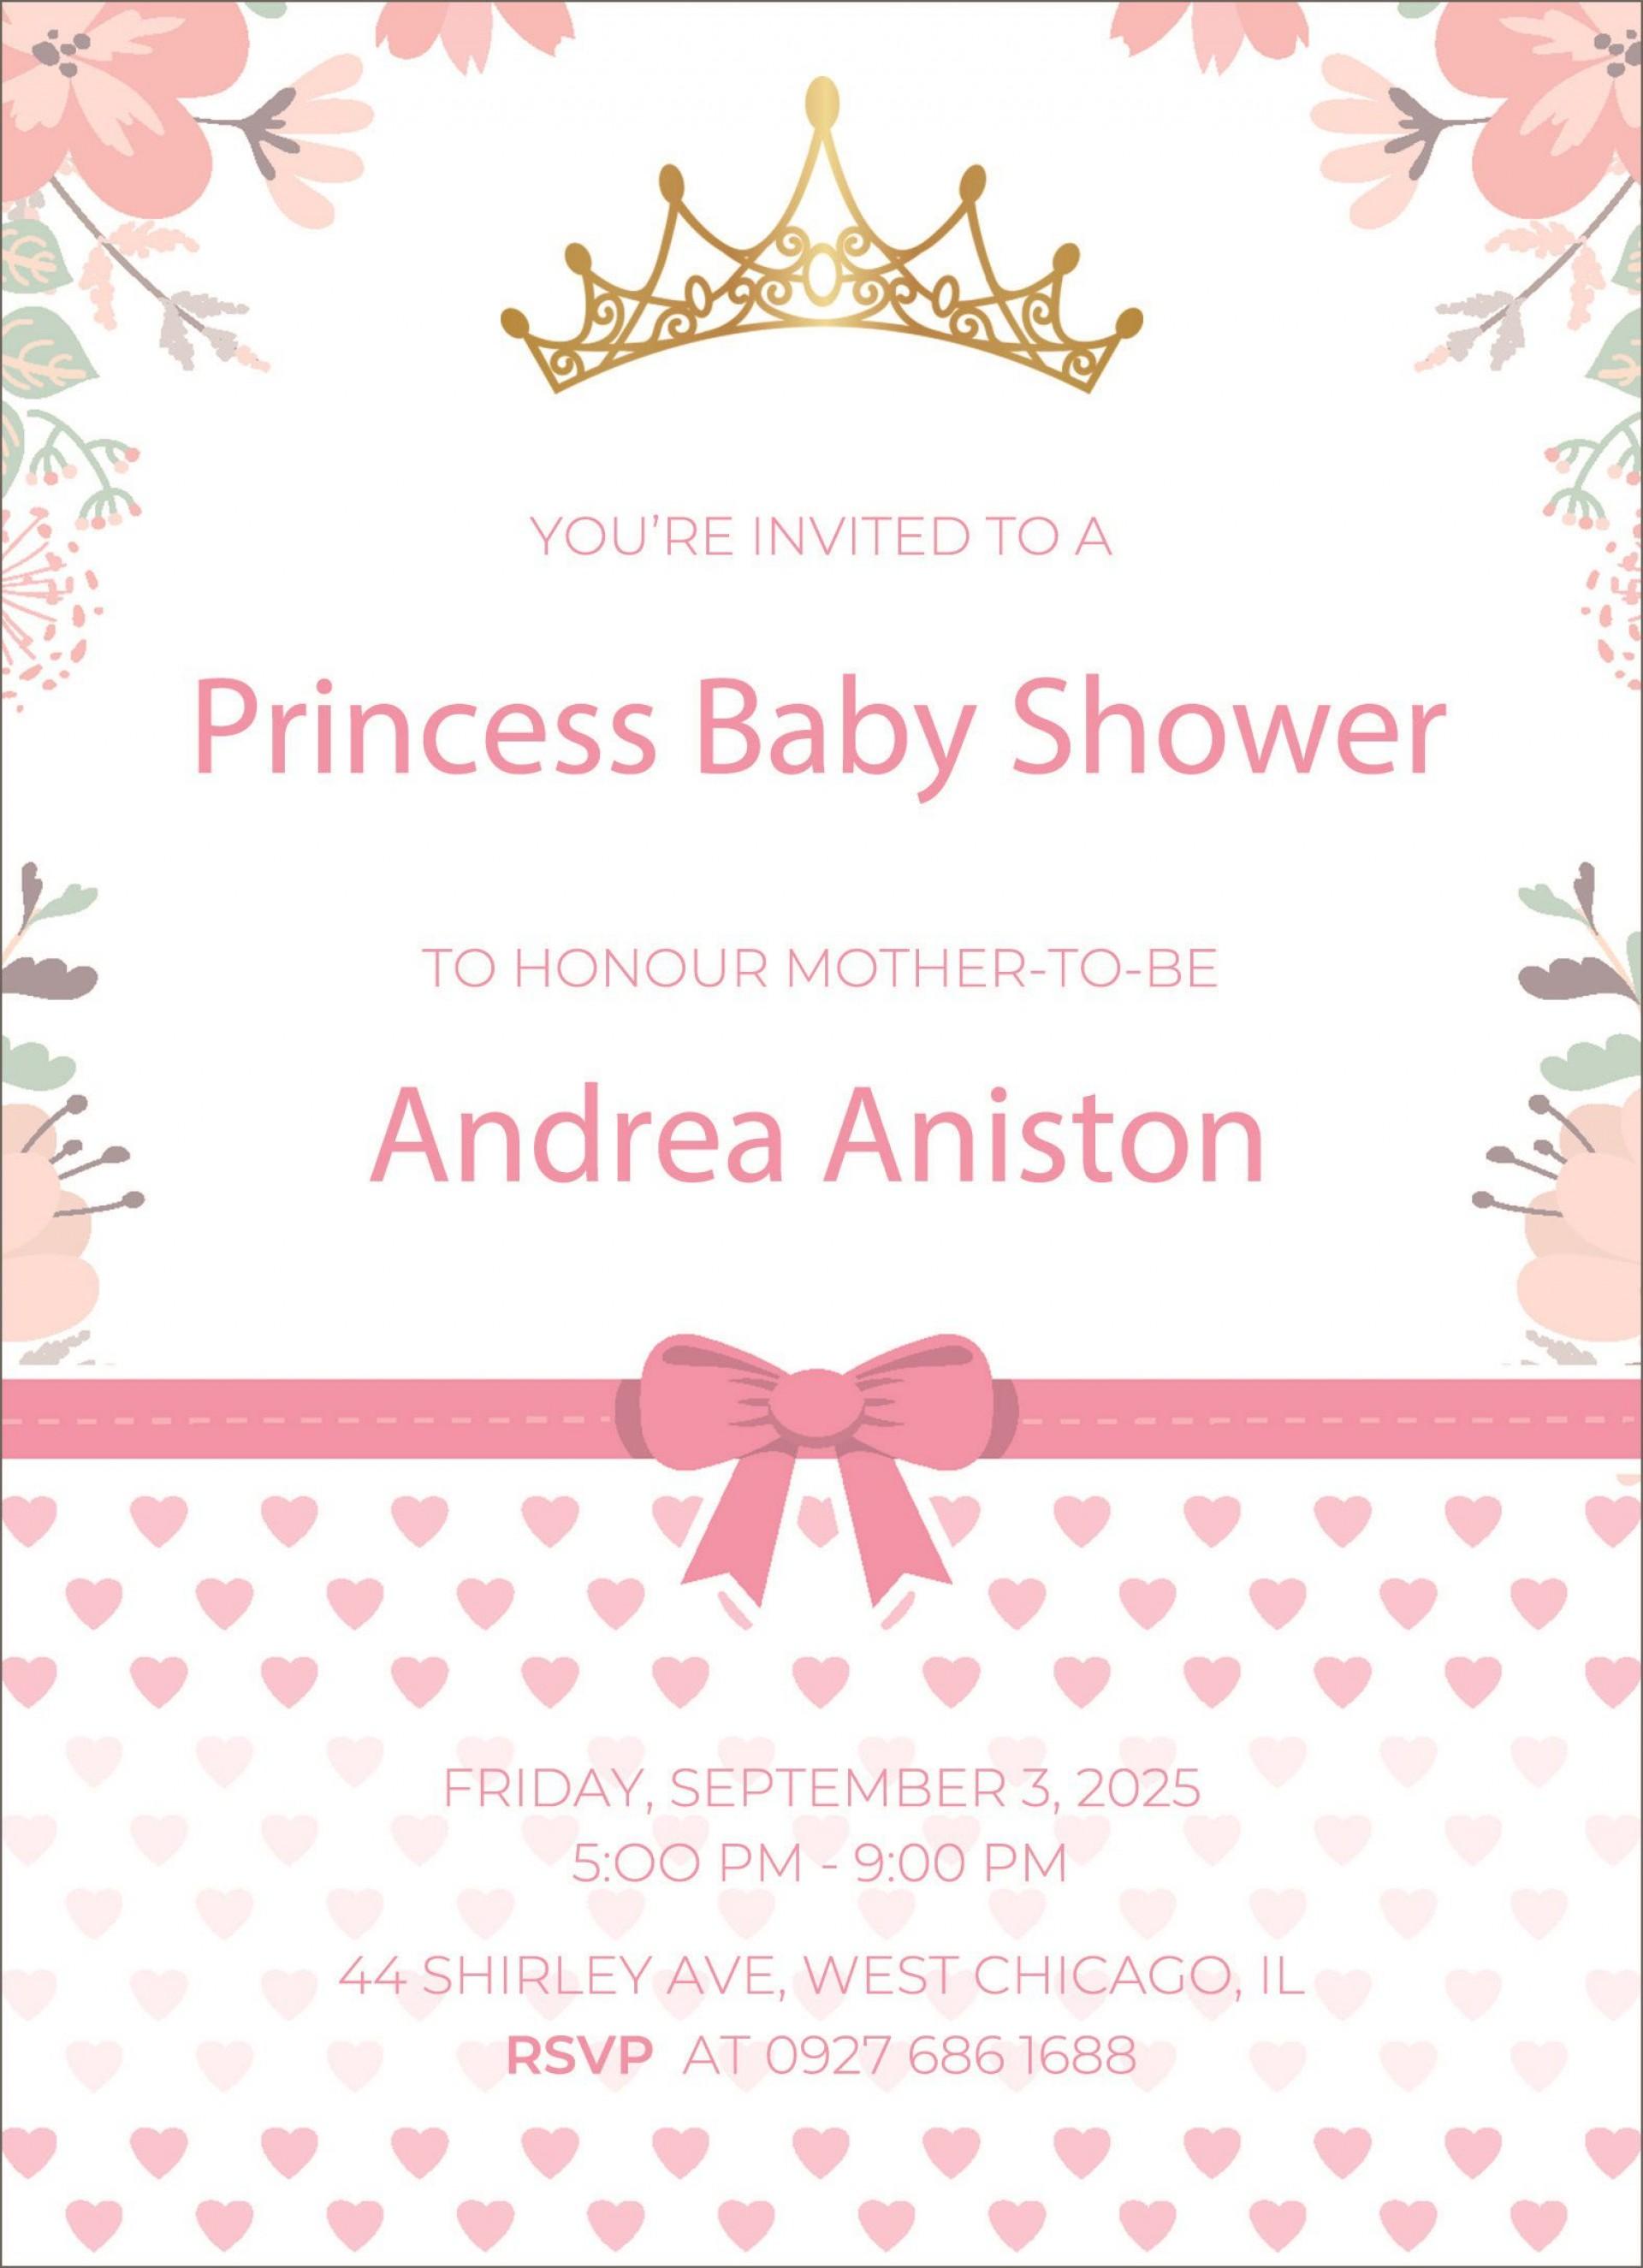 005 Shocking Microsoft Word Invitation Template Baby Shower Example  Free Editable Invite1920